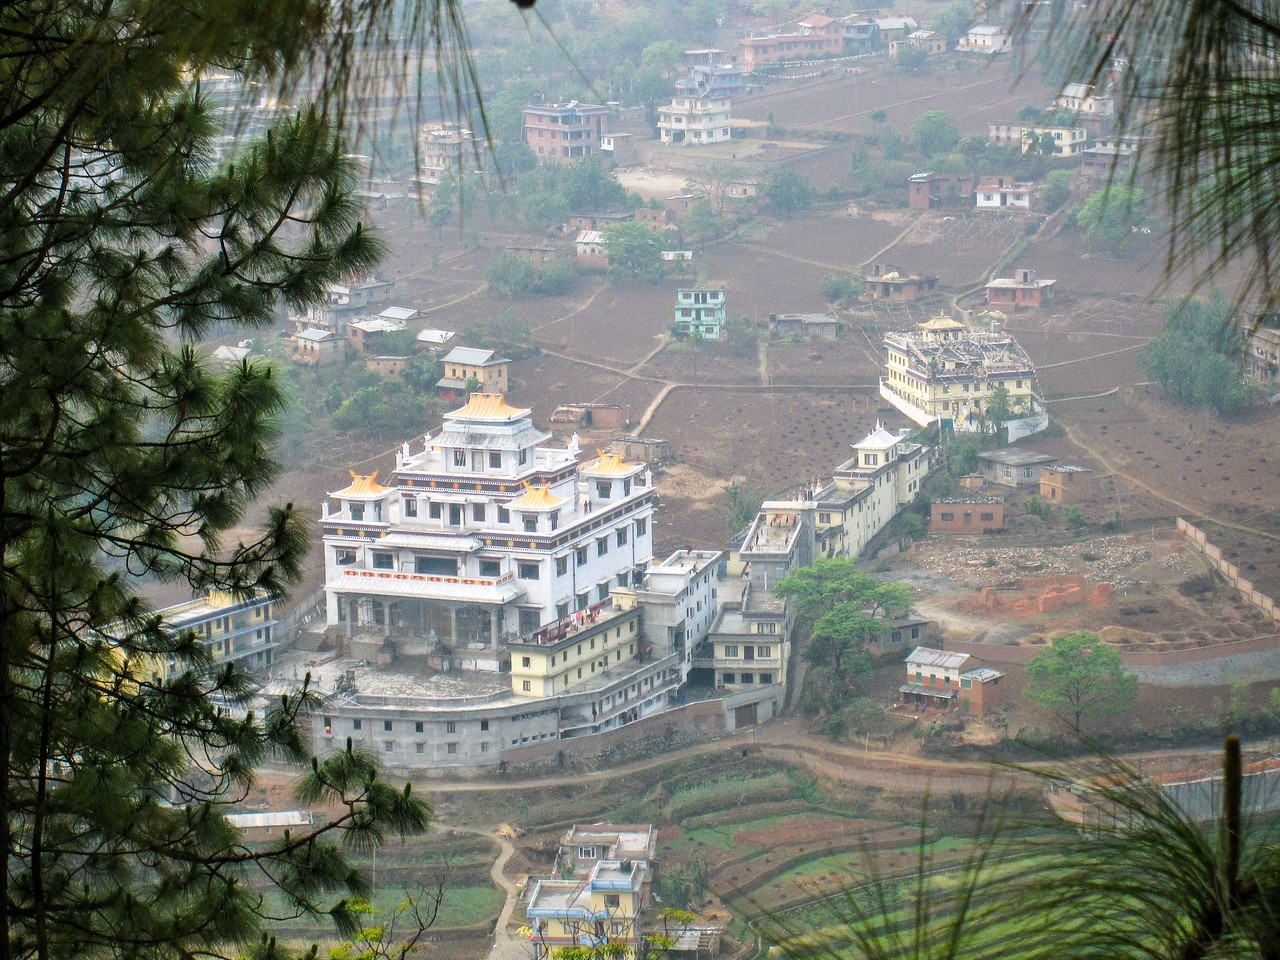 Views of the Kathmandu Valley from the mountain near Pharping, Nepal